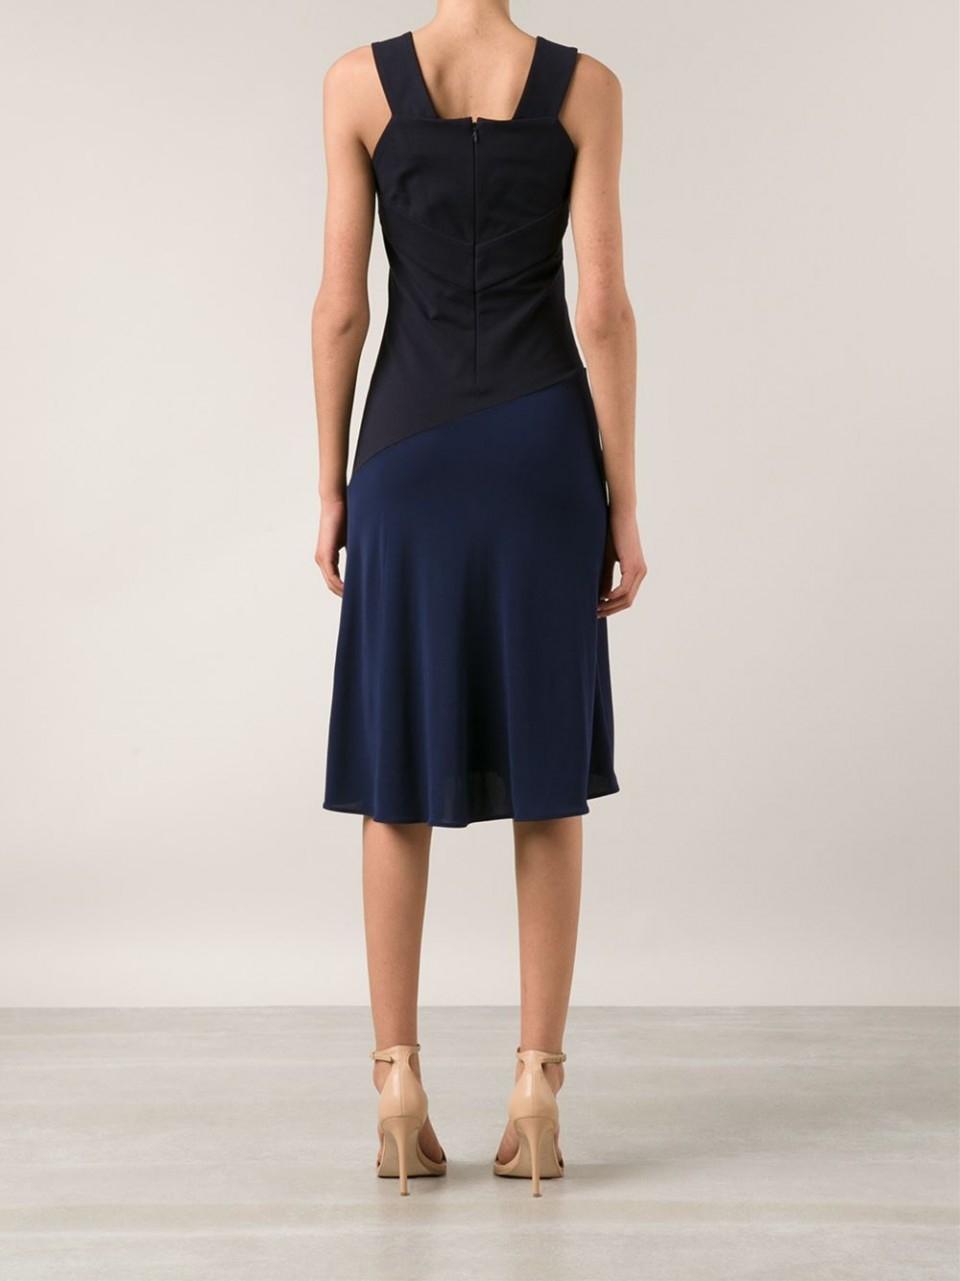 Lyst - Stella McCartney Fitted Midi Dress in Blue